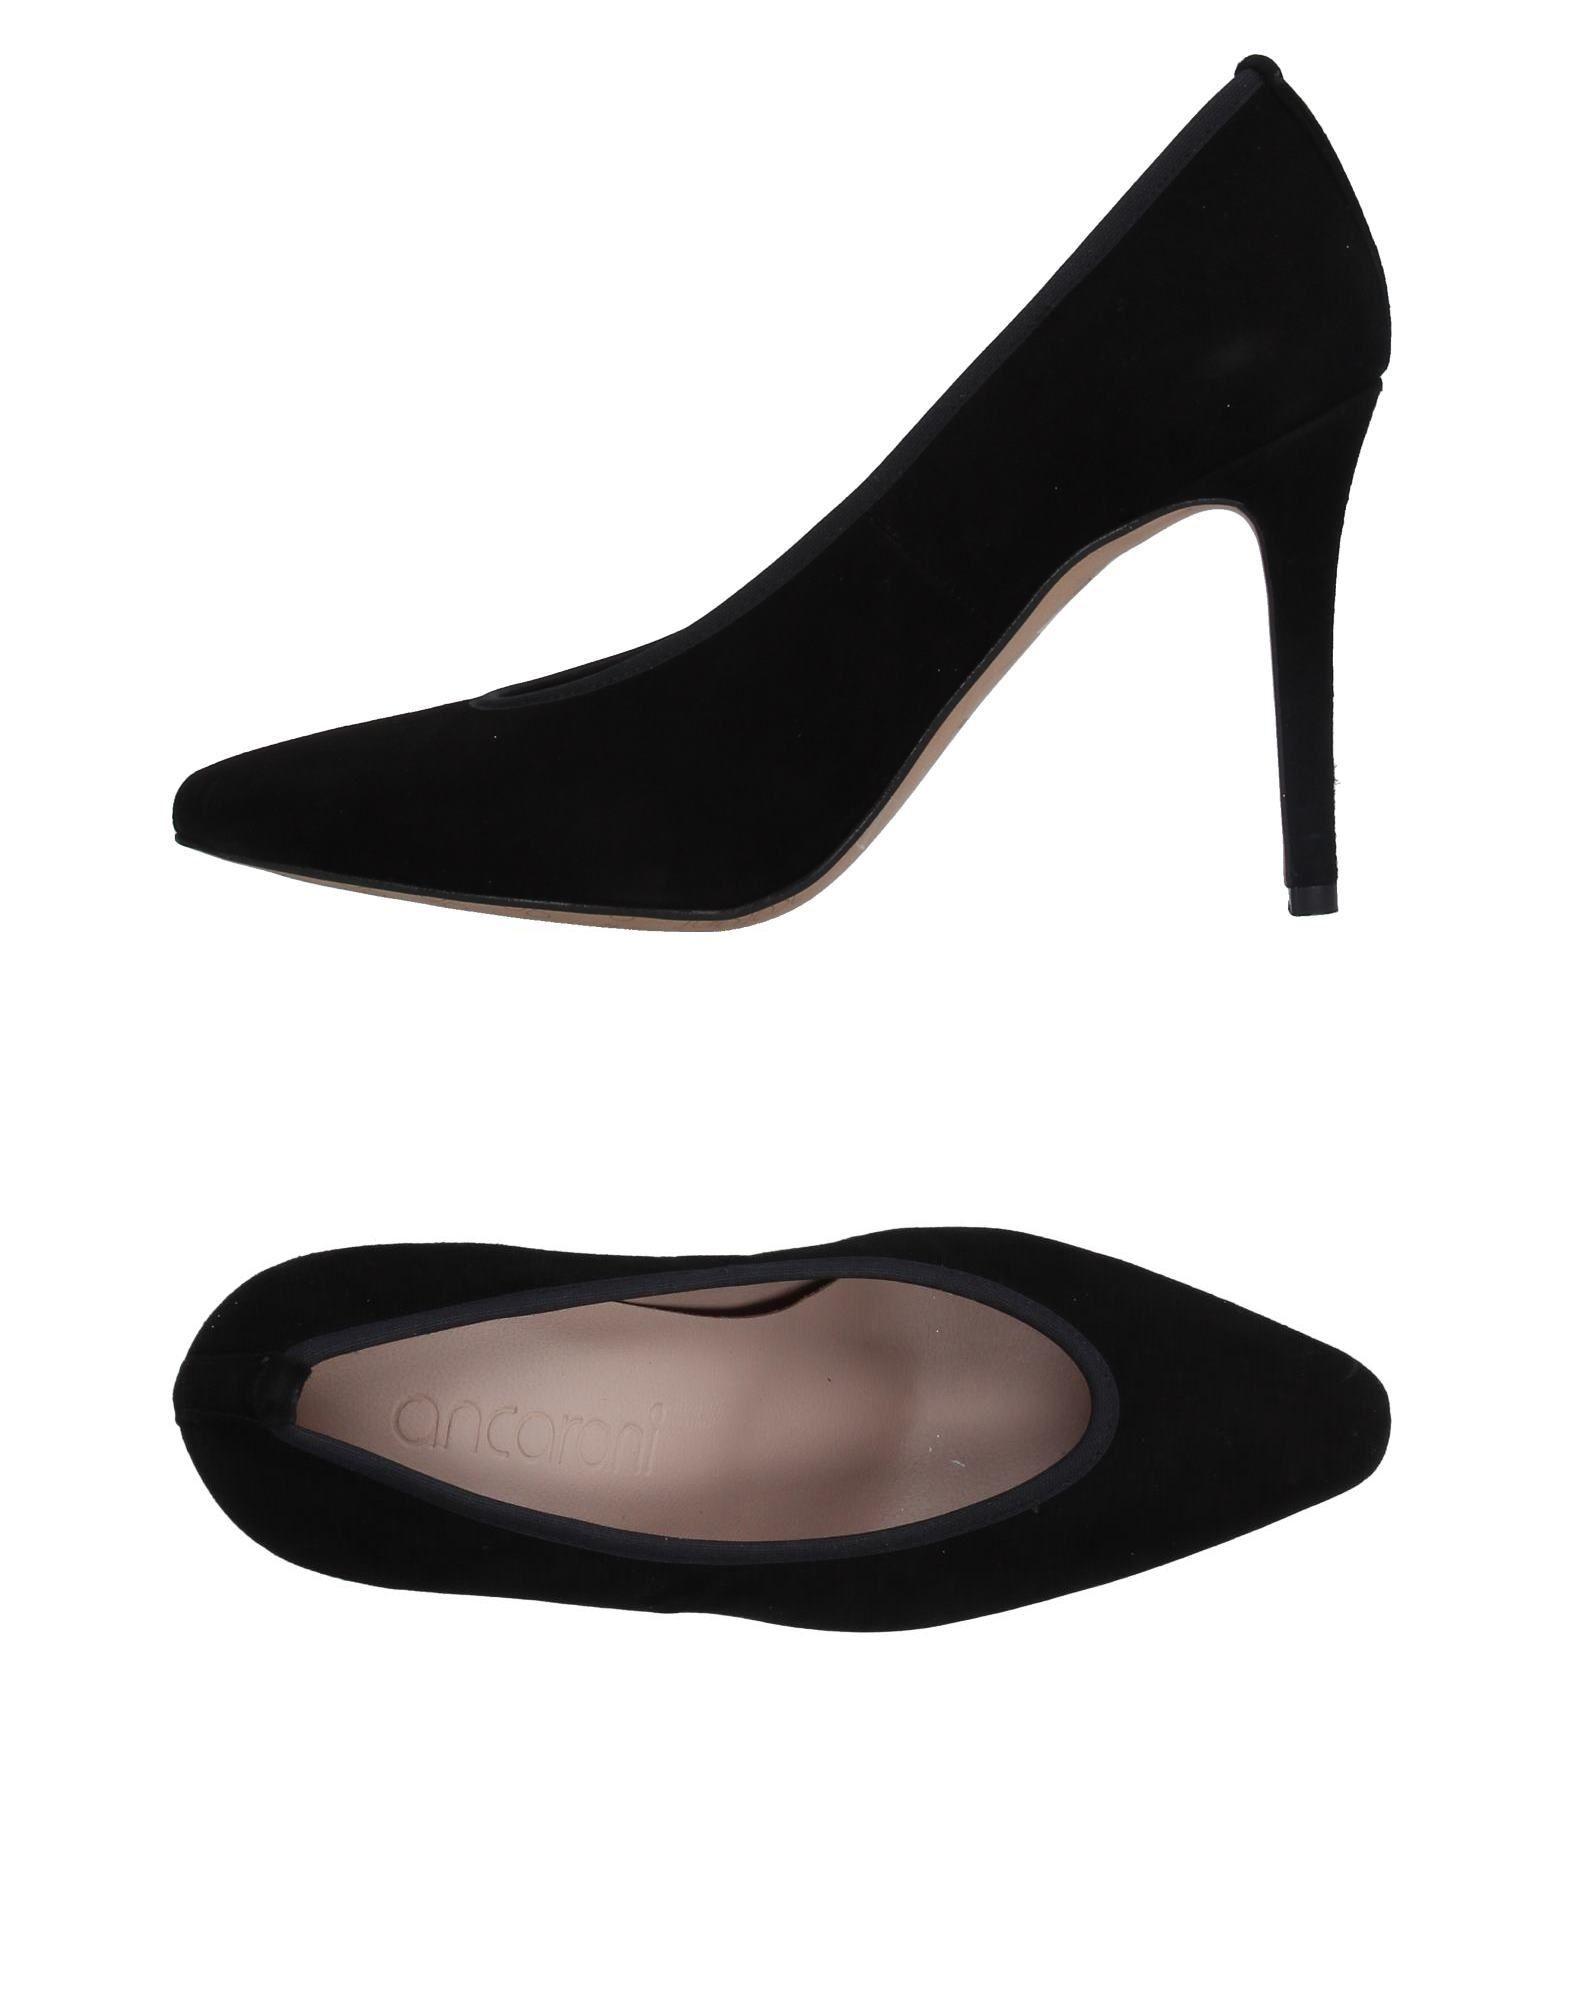 Haltbare Mode billige Schuhe Ancarani Pumps Damen  11226384UN Heiße Schuhe